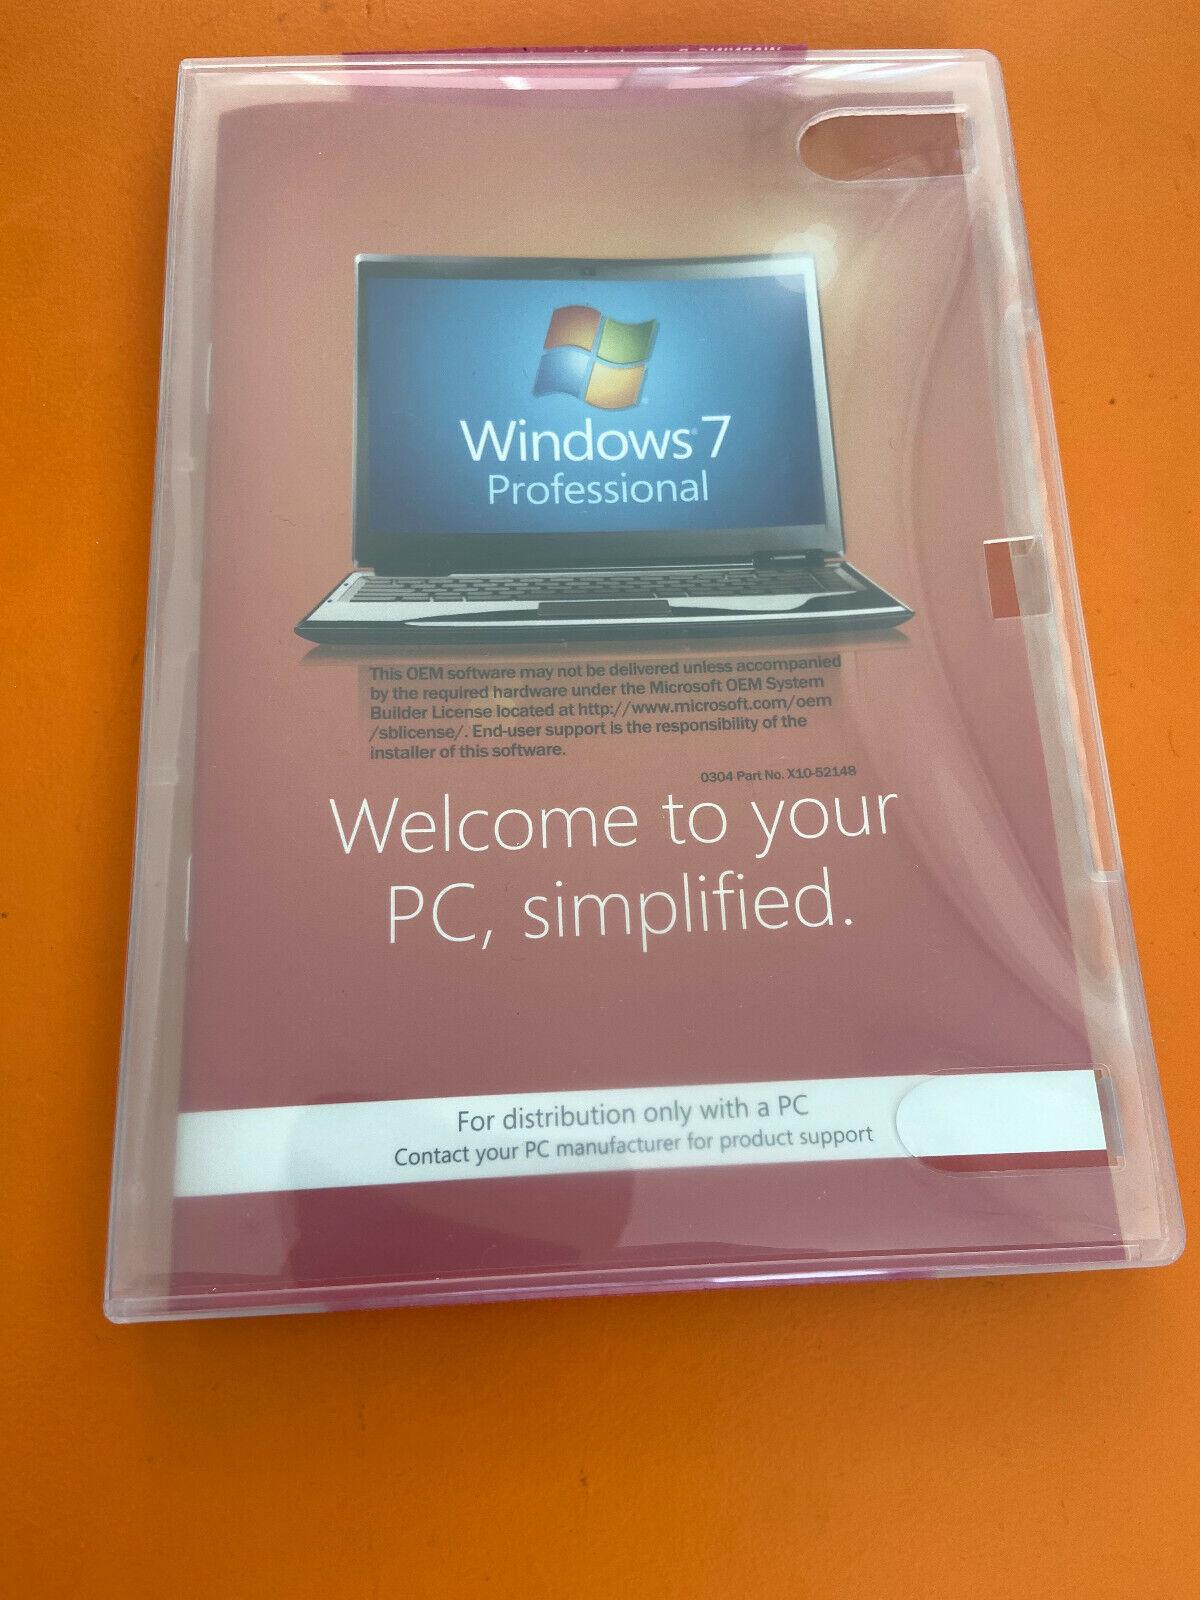 Dell Windows 7 Professional 32bit Dvd W Cd Key Very Fast Free Shipping For Sale Online Ebay